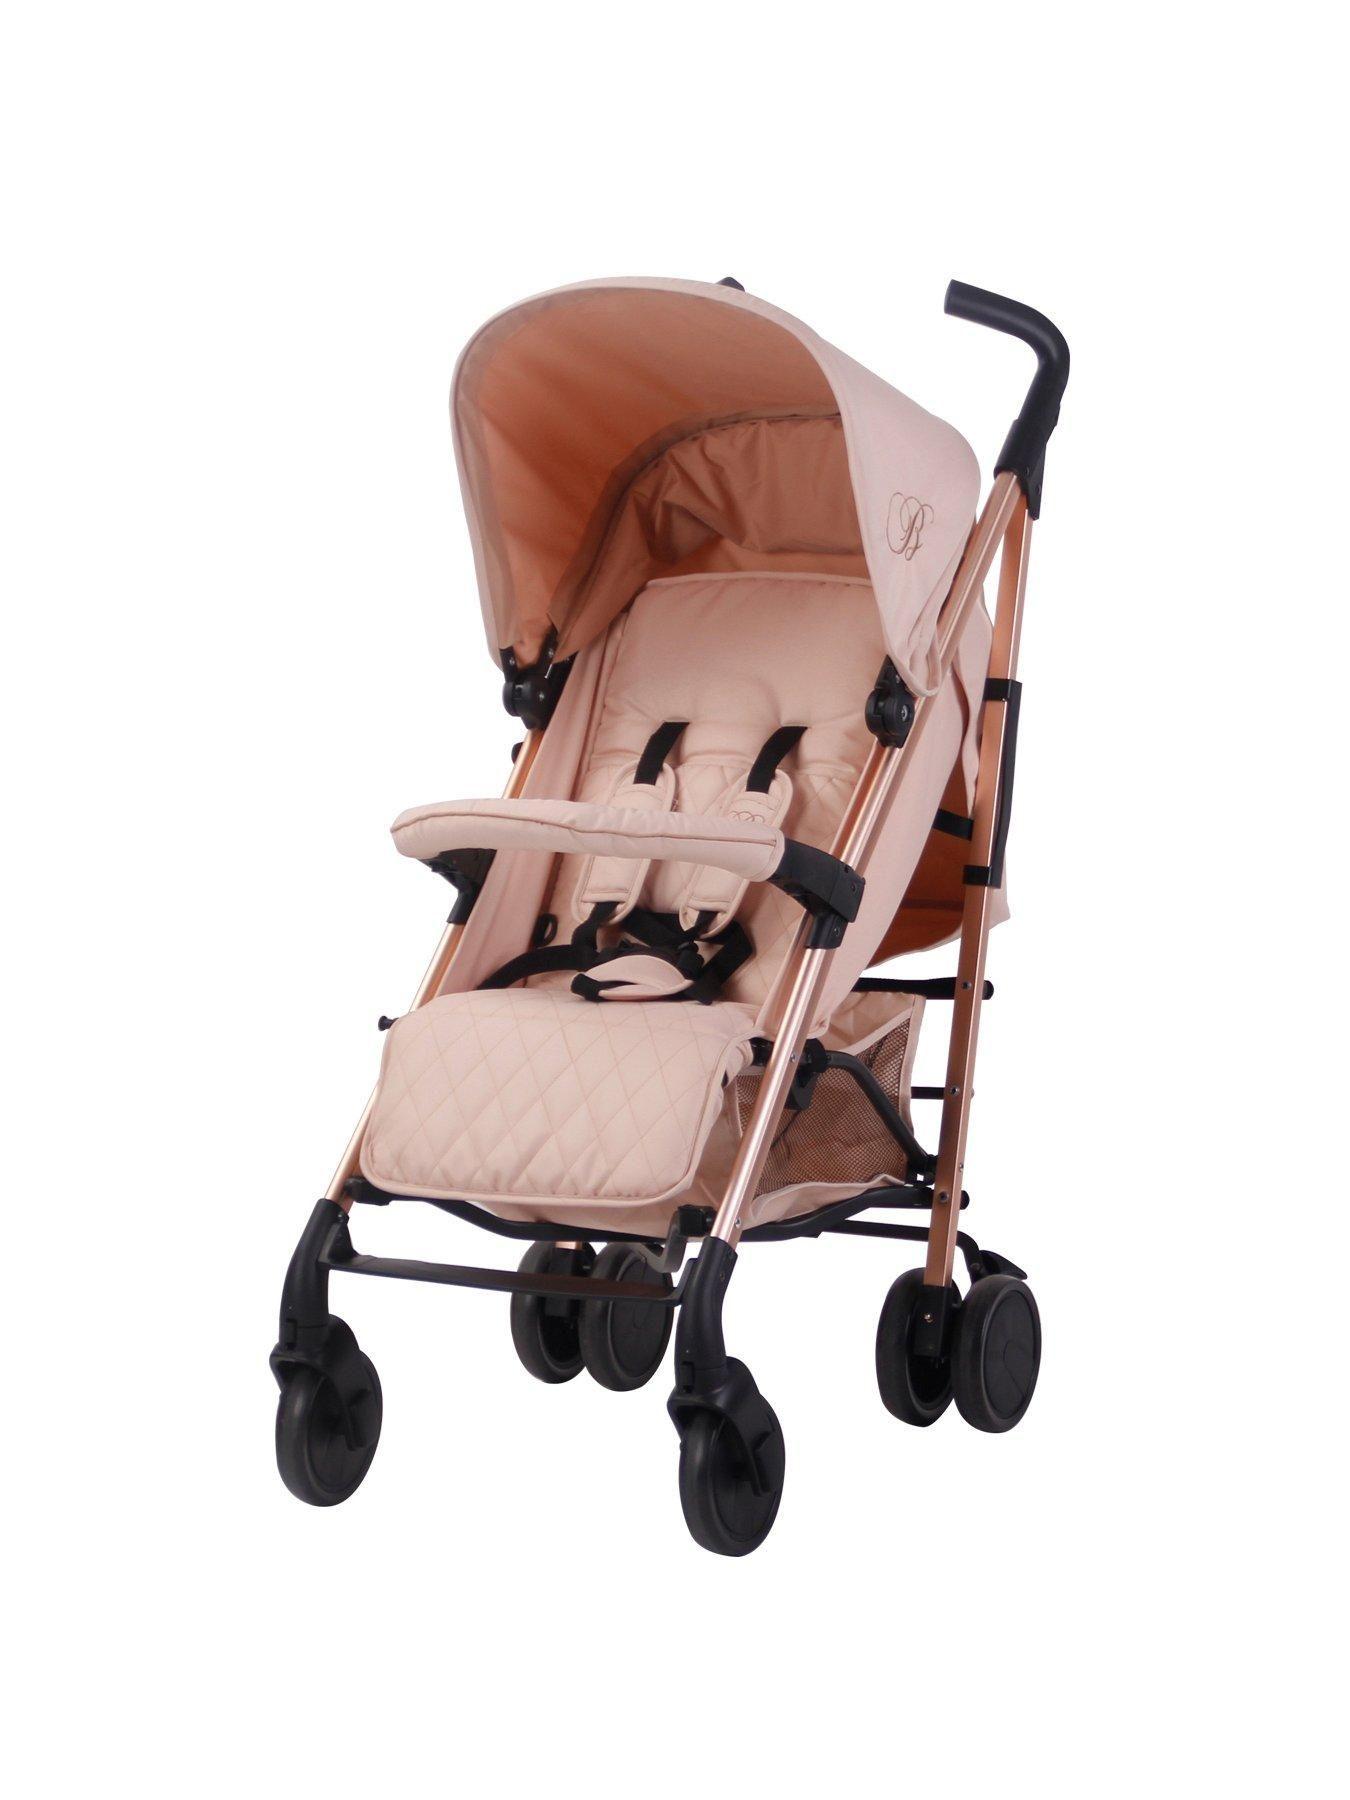 My Babiie Billie Faiers MB51 Rose Gold & Blush Stroller